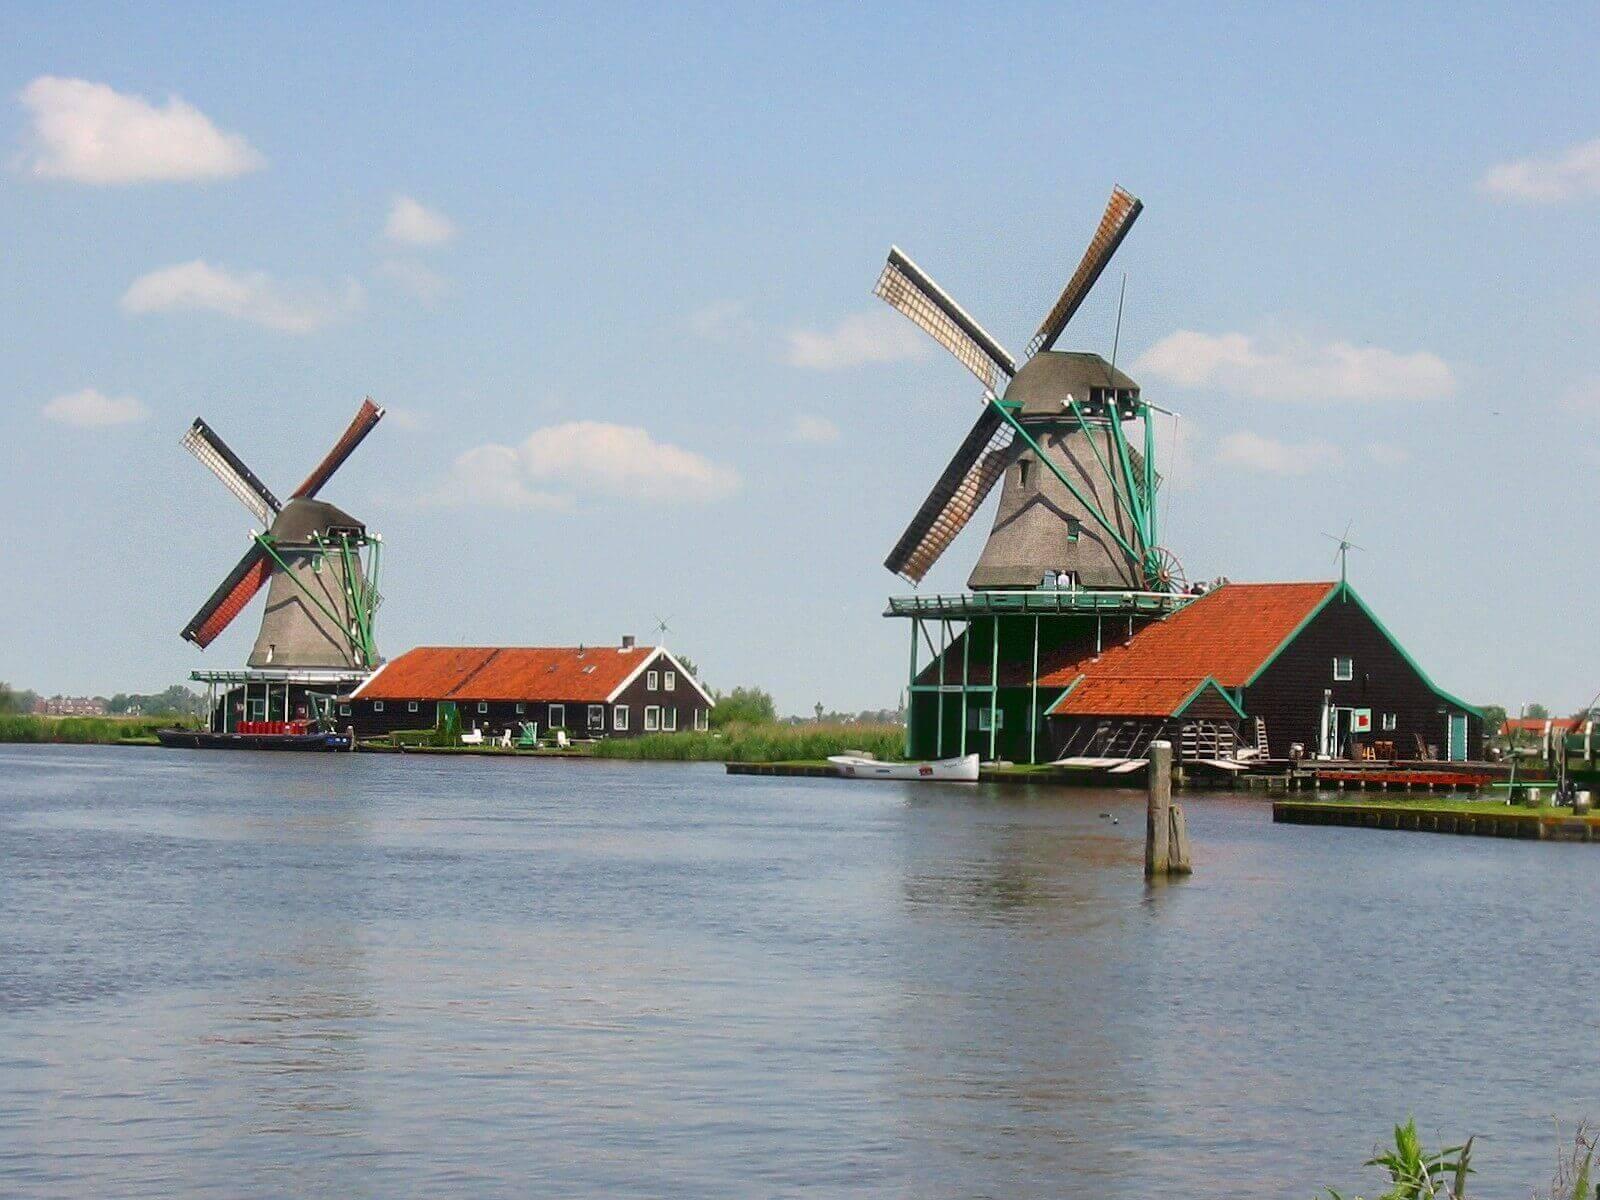 Händlermeeting mit Rahmenprogramm in Amsterdam